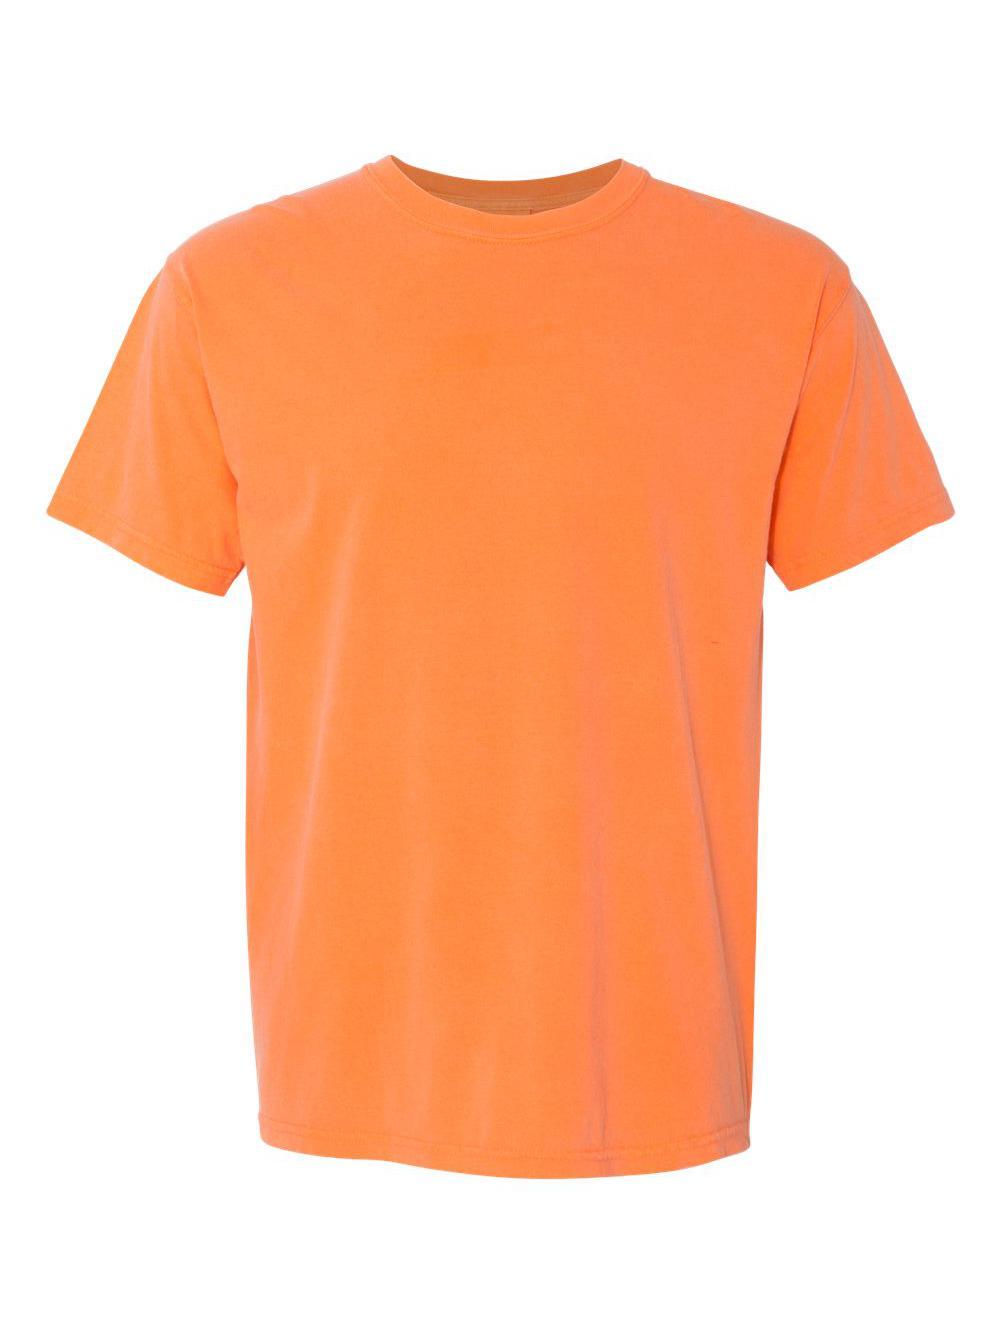 Comfort-Colors-Garment-Dyed-Heavyweight-Ringspun-Short-Sleeve-Shirt-1717 thumbnail 84